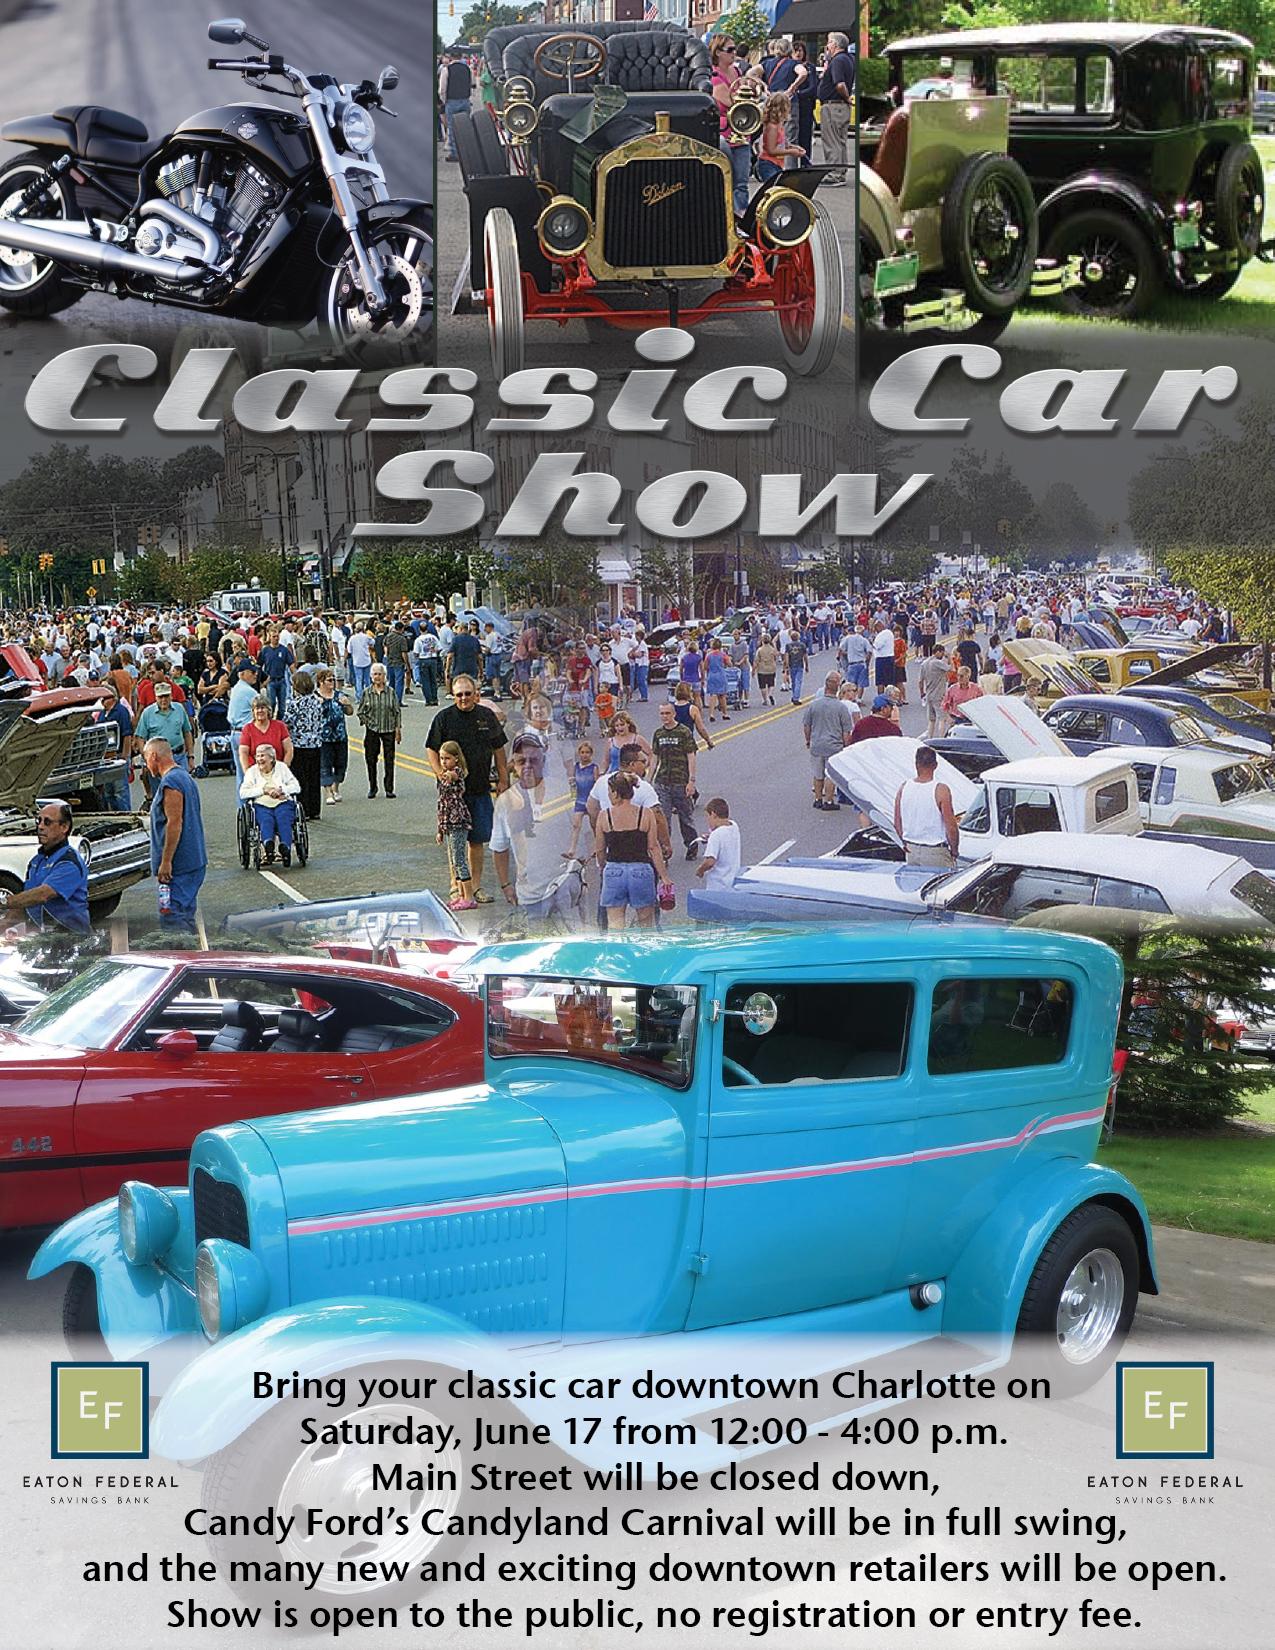 Classic Car Show - Charlotte Chamber of Commerce - Charlotte, Michigan